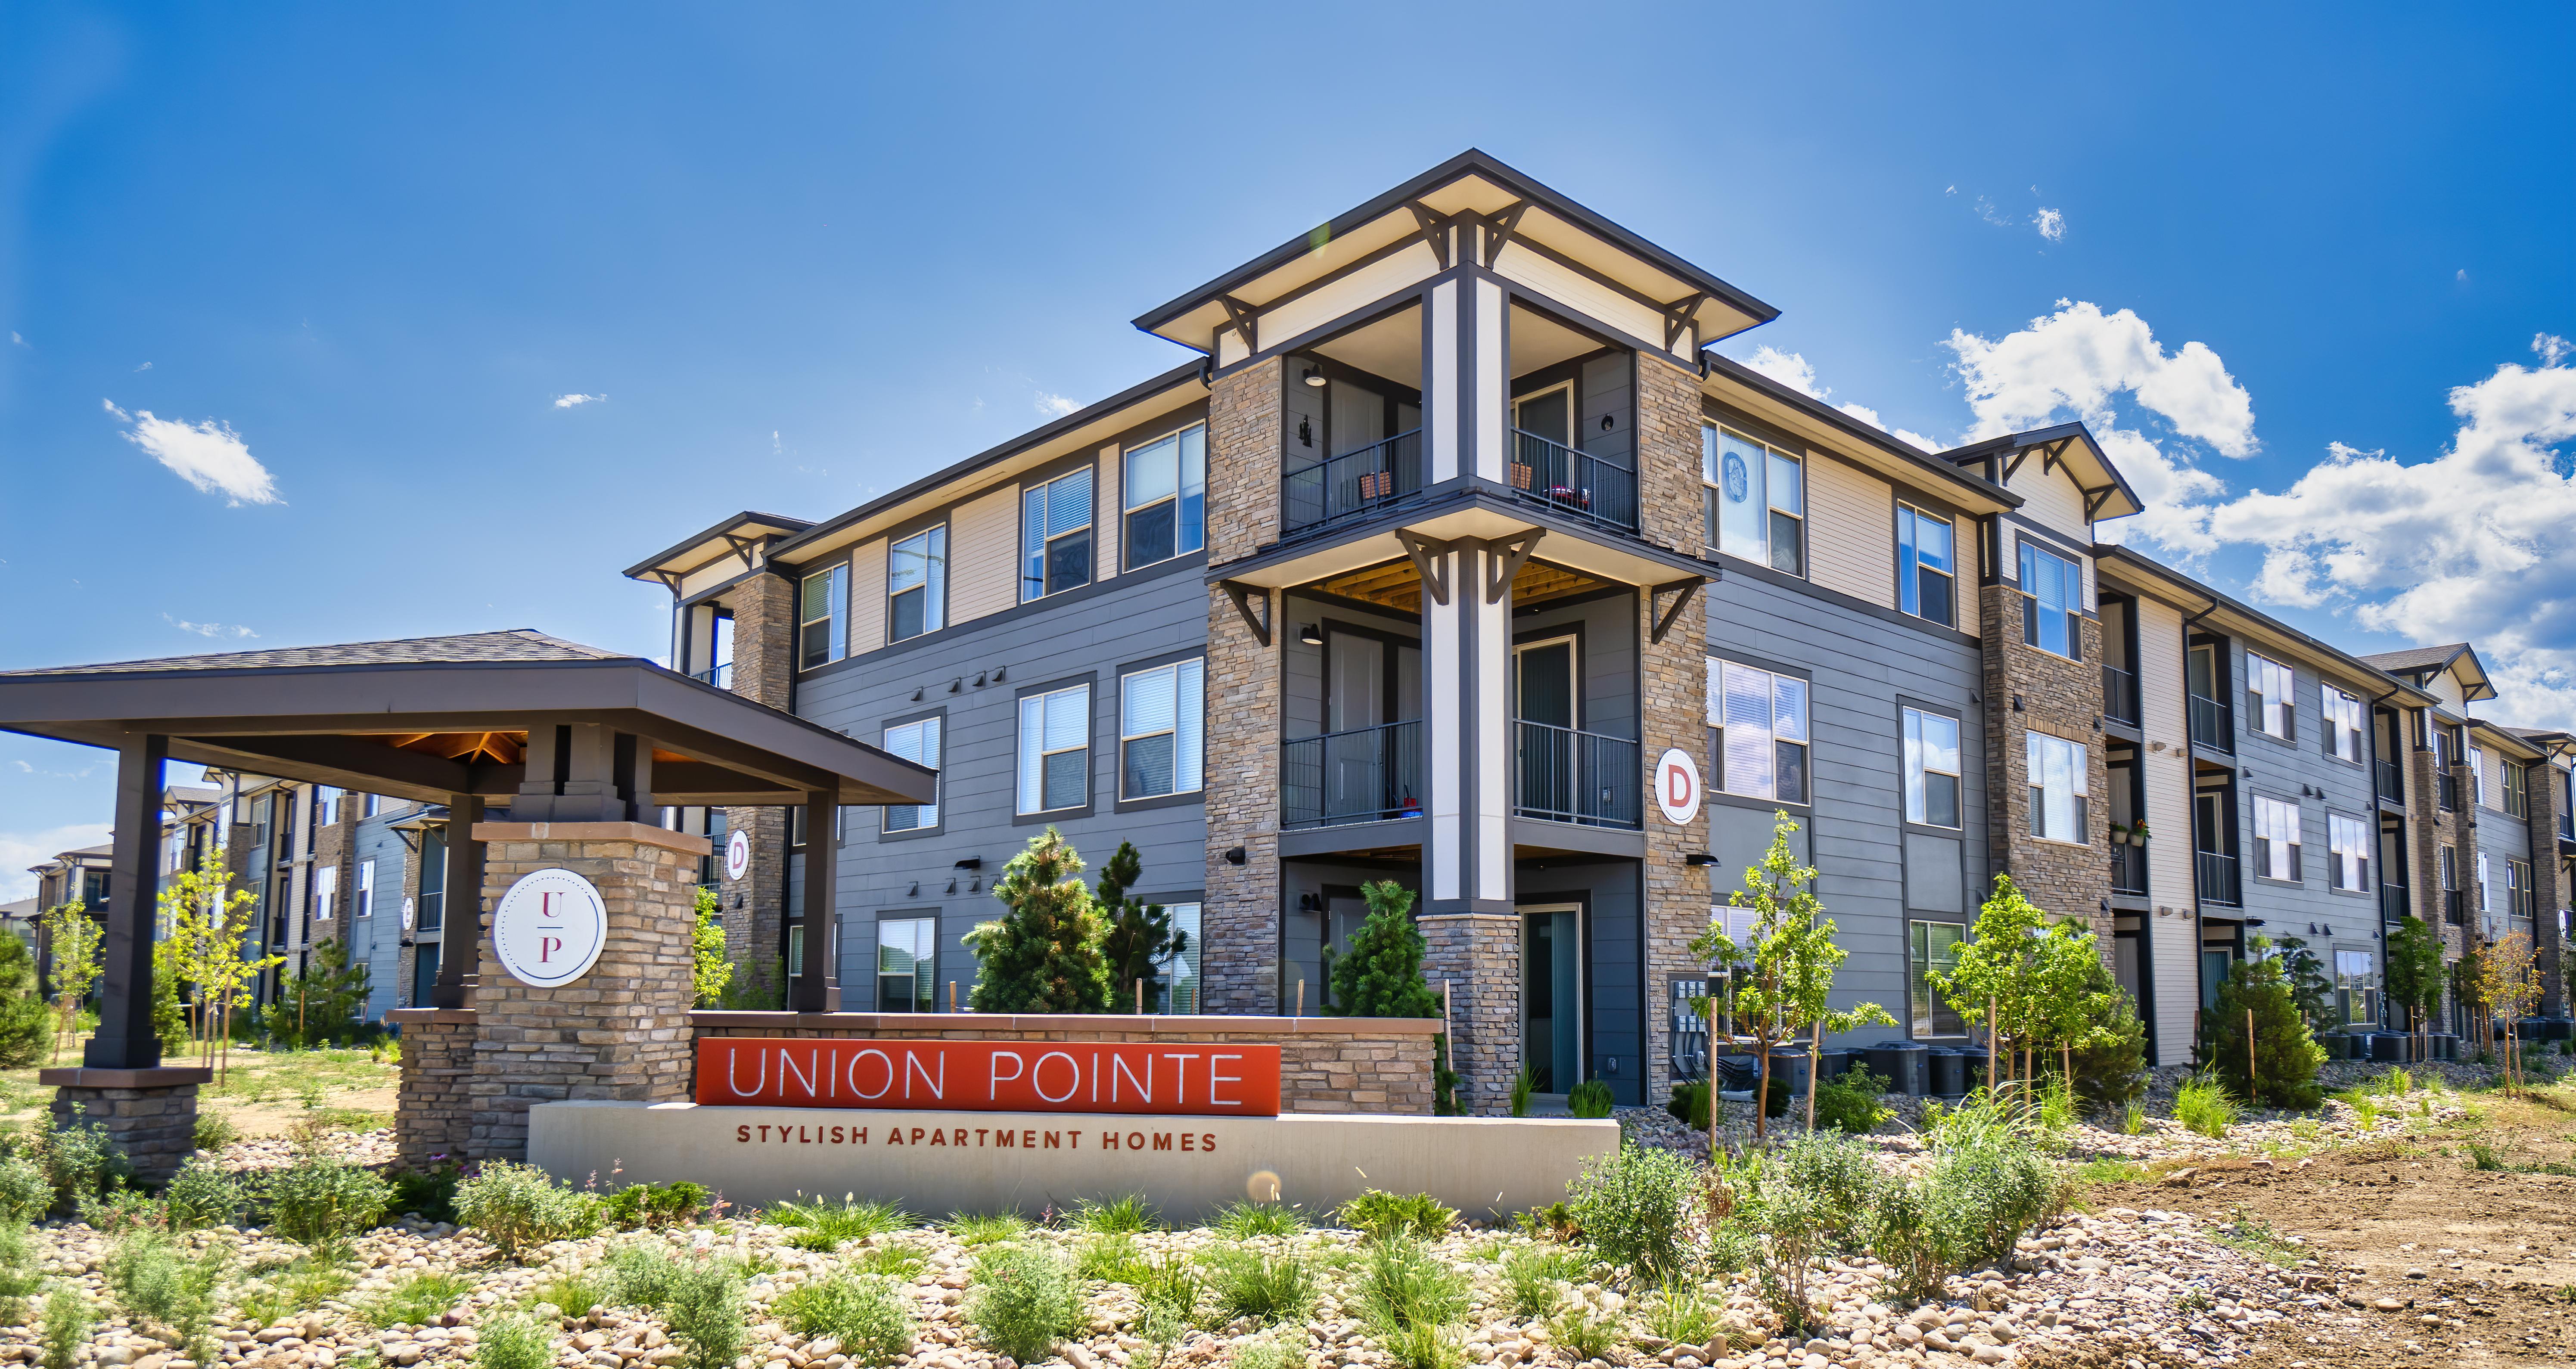 |Union Pointe|